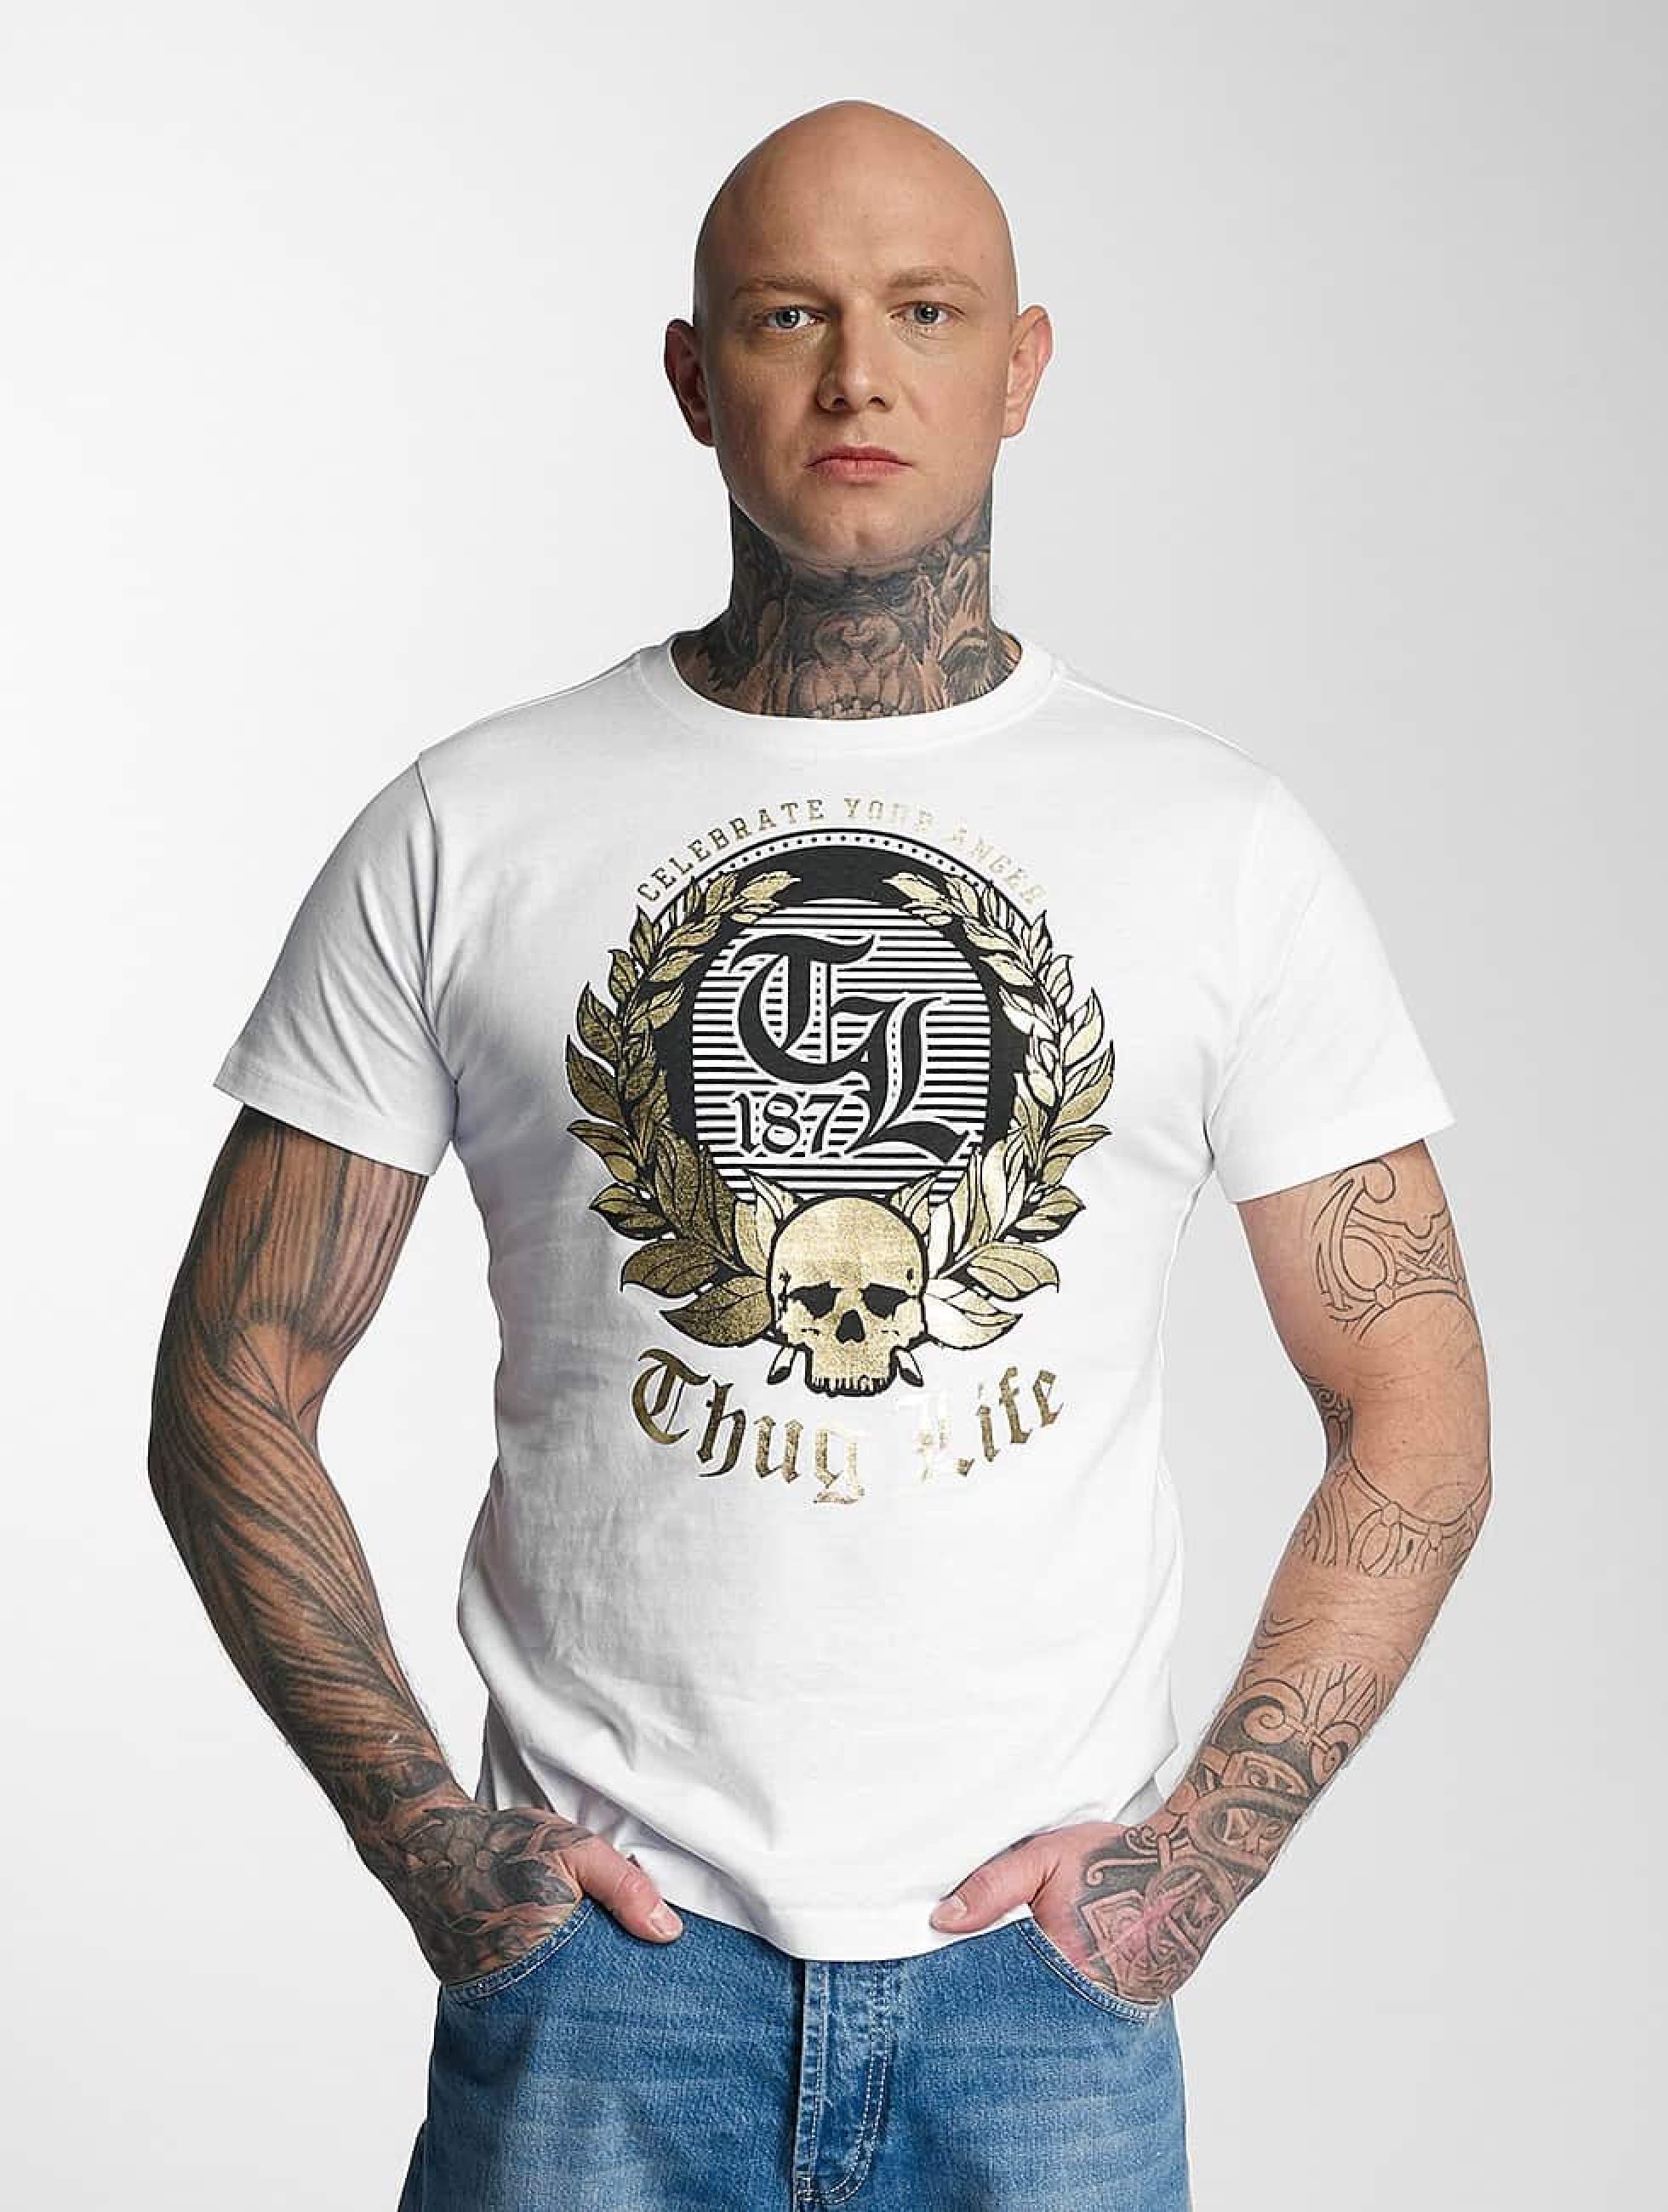 Thug Life / T-Shirt Celebrate in white S